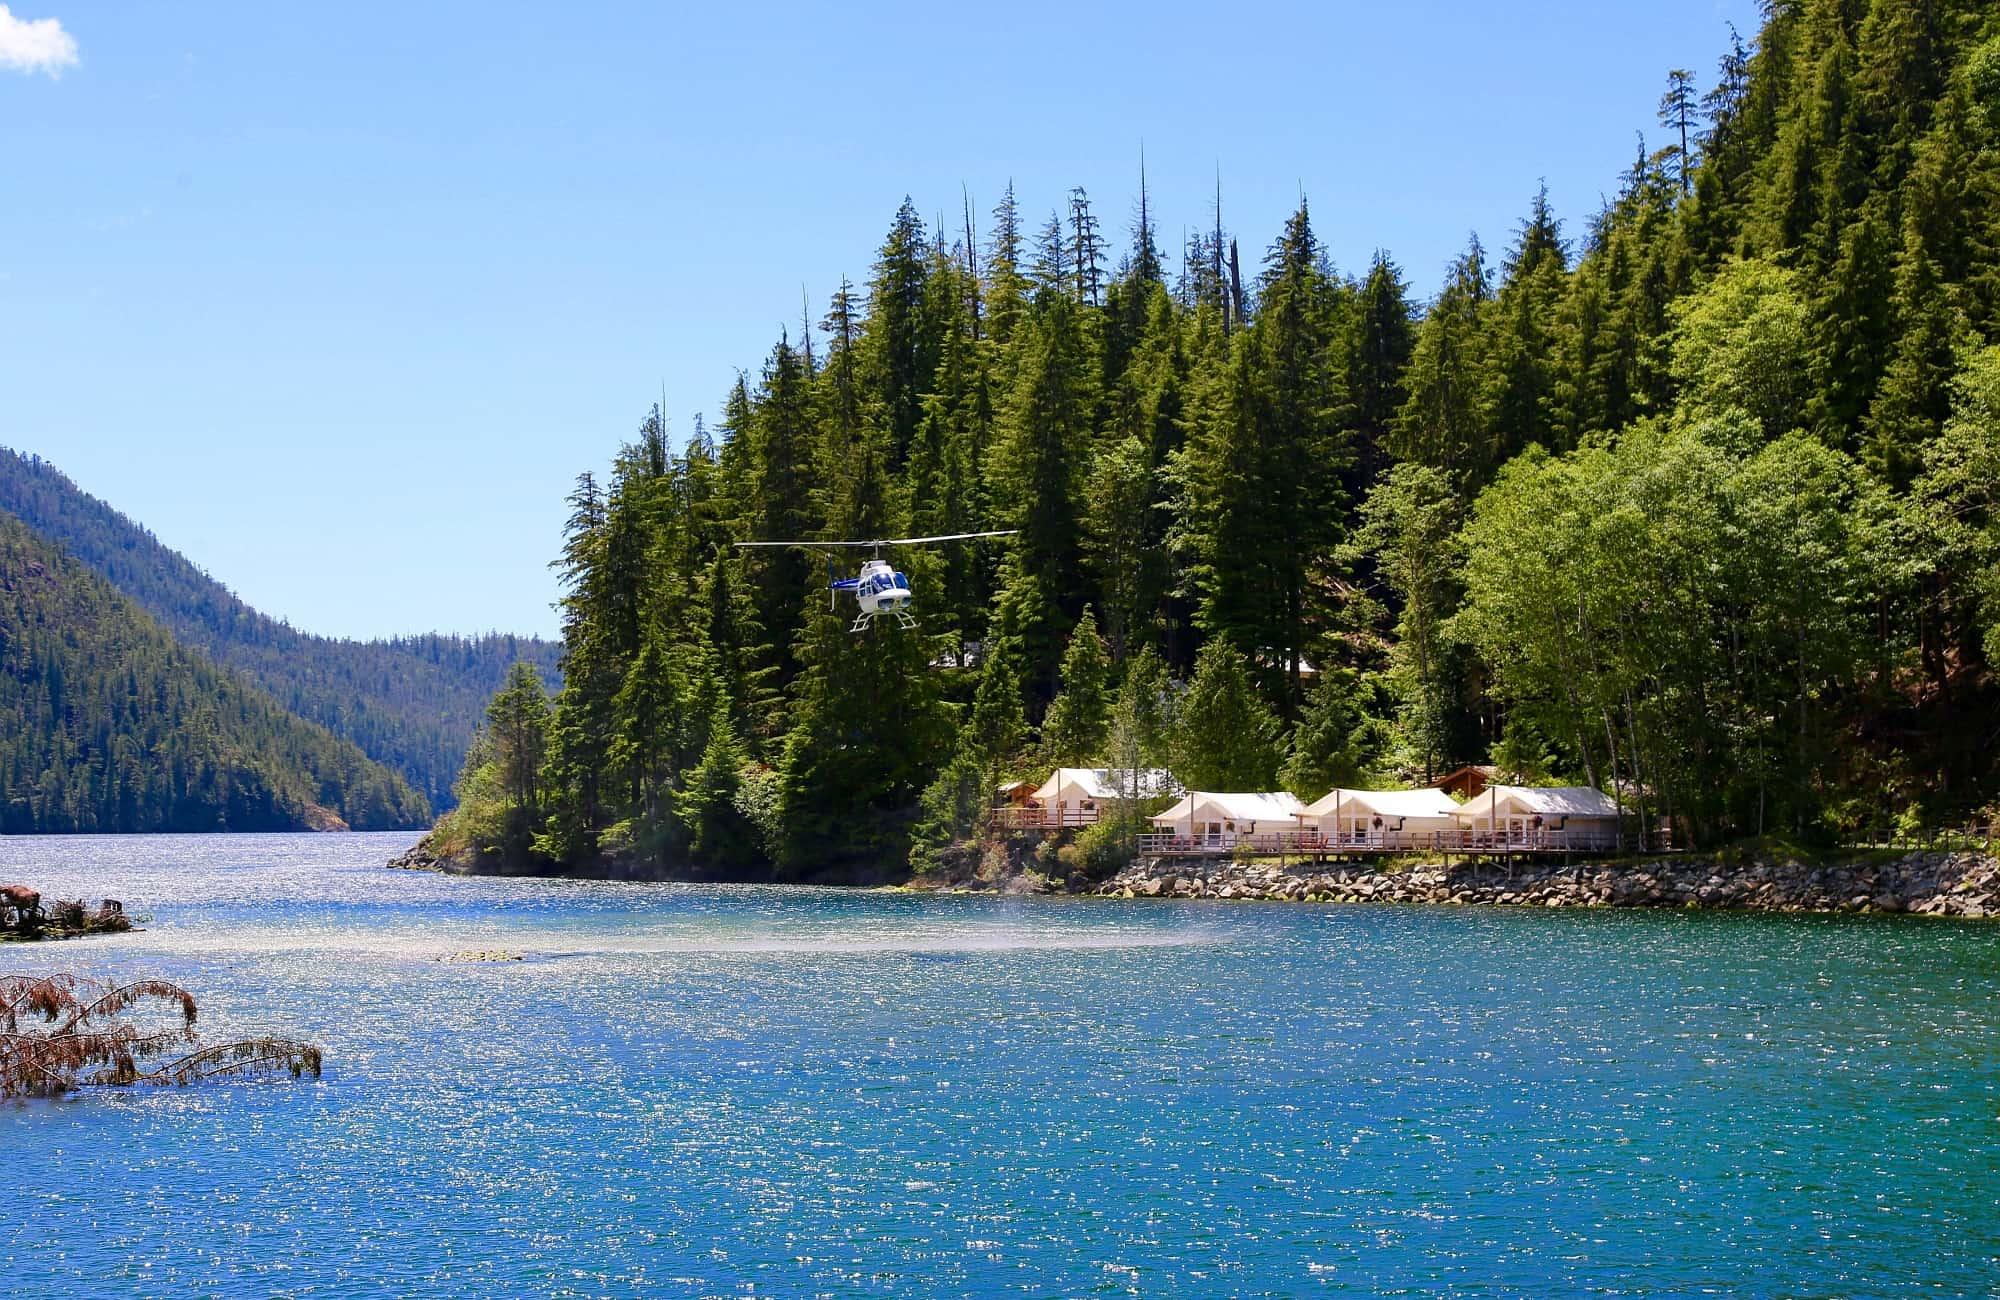 Atterrissage en douceur au Clayoquot Wilderness Resort